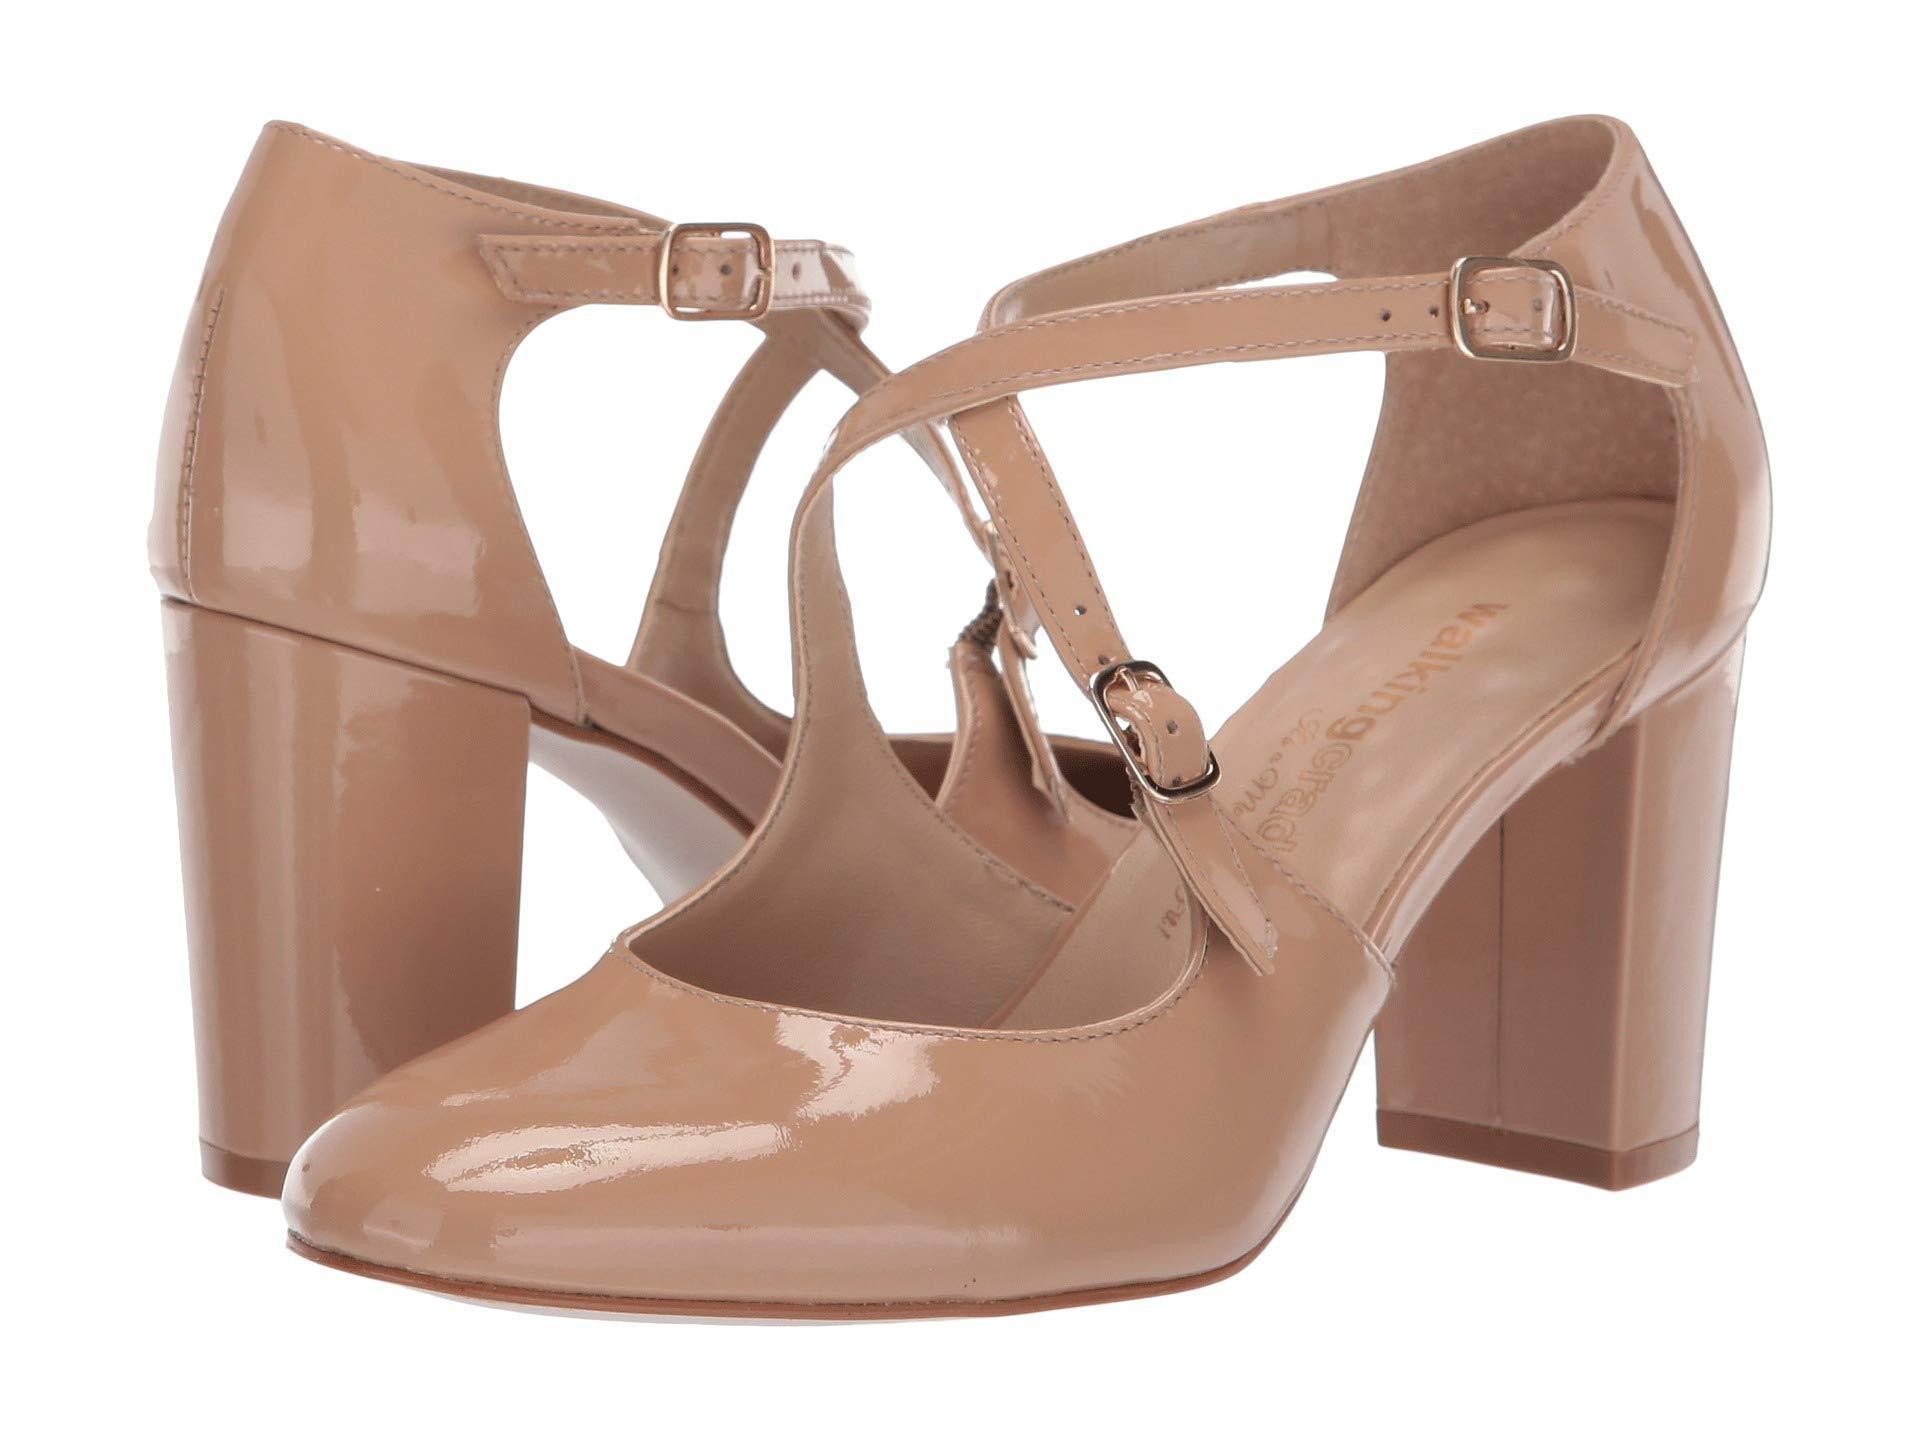 0417e32b5c Walking Cradles Mariah (nude Patent Leather) High Heels in Natural ...